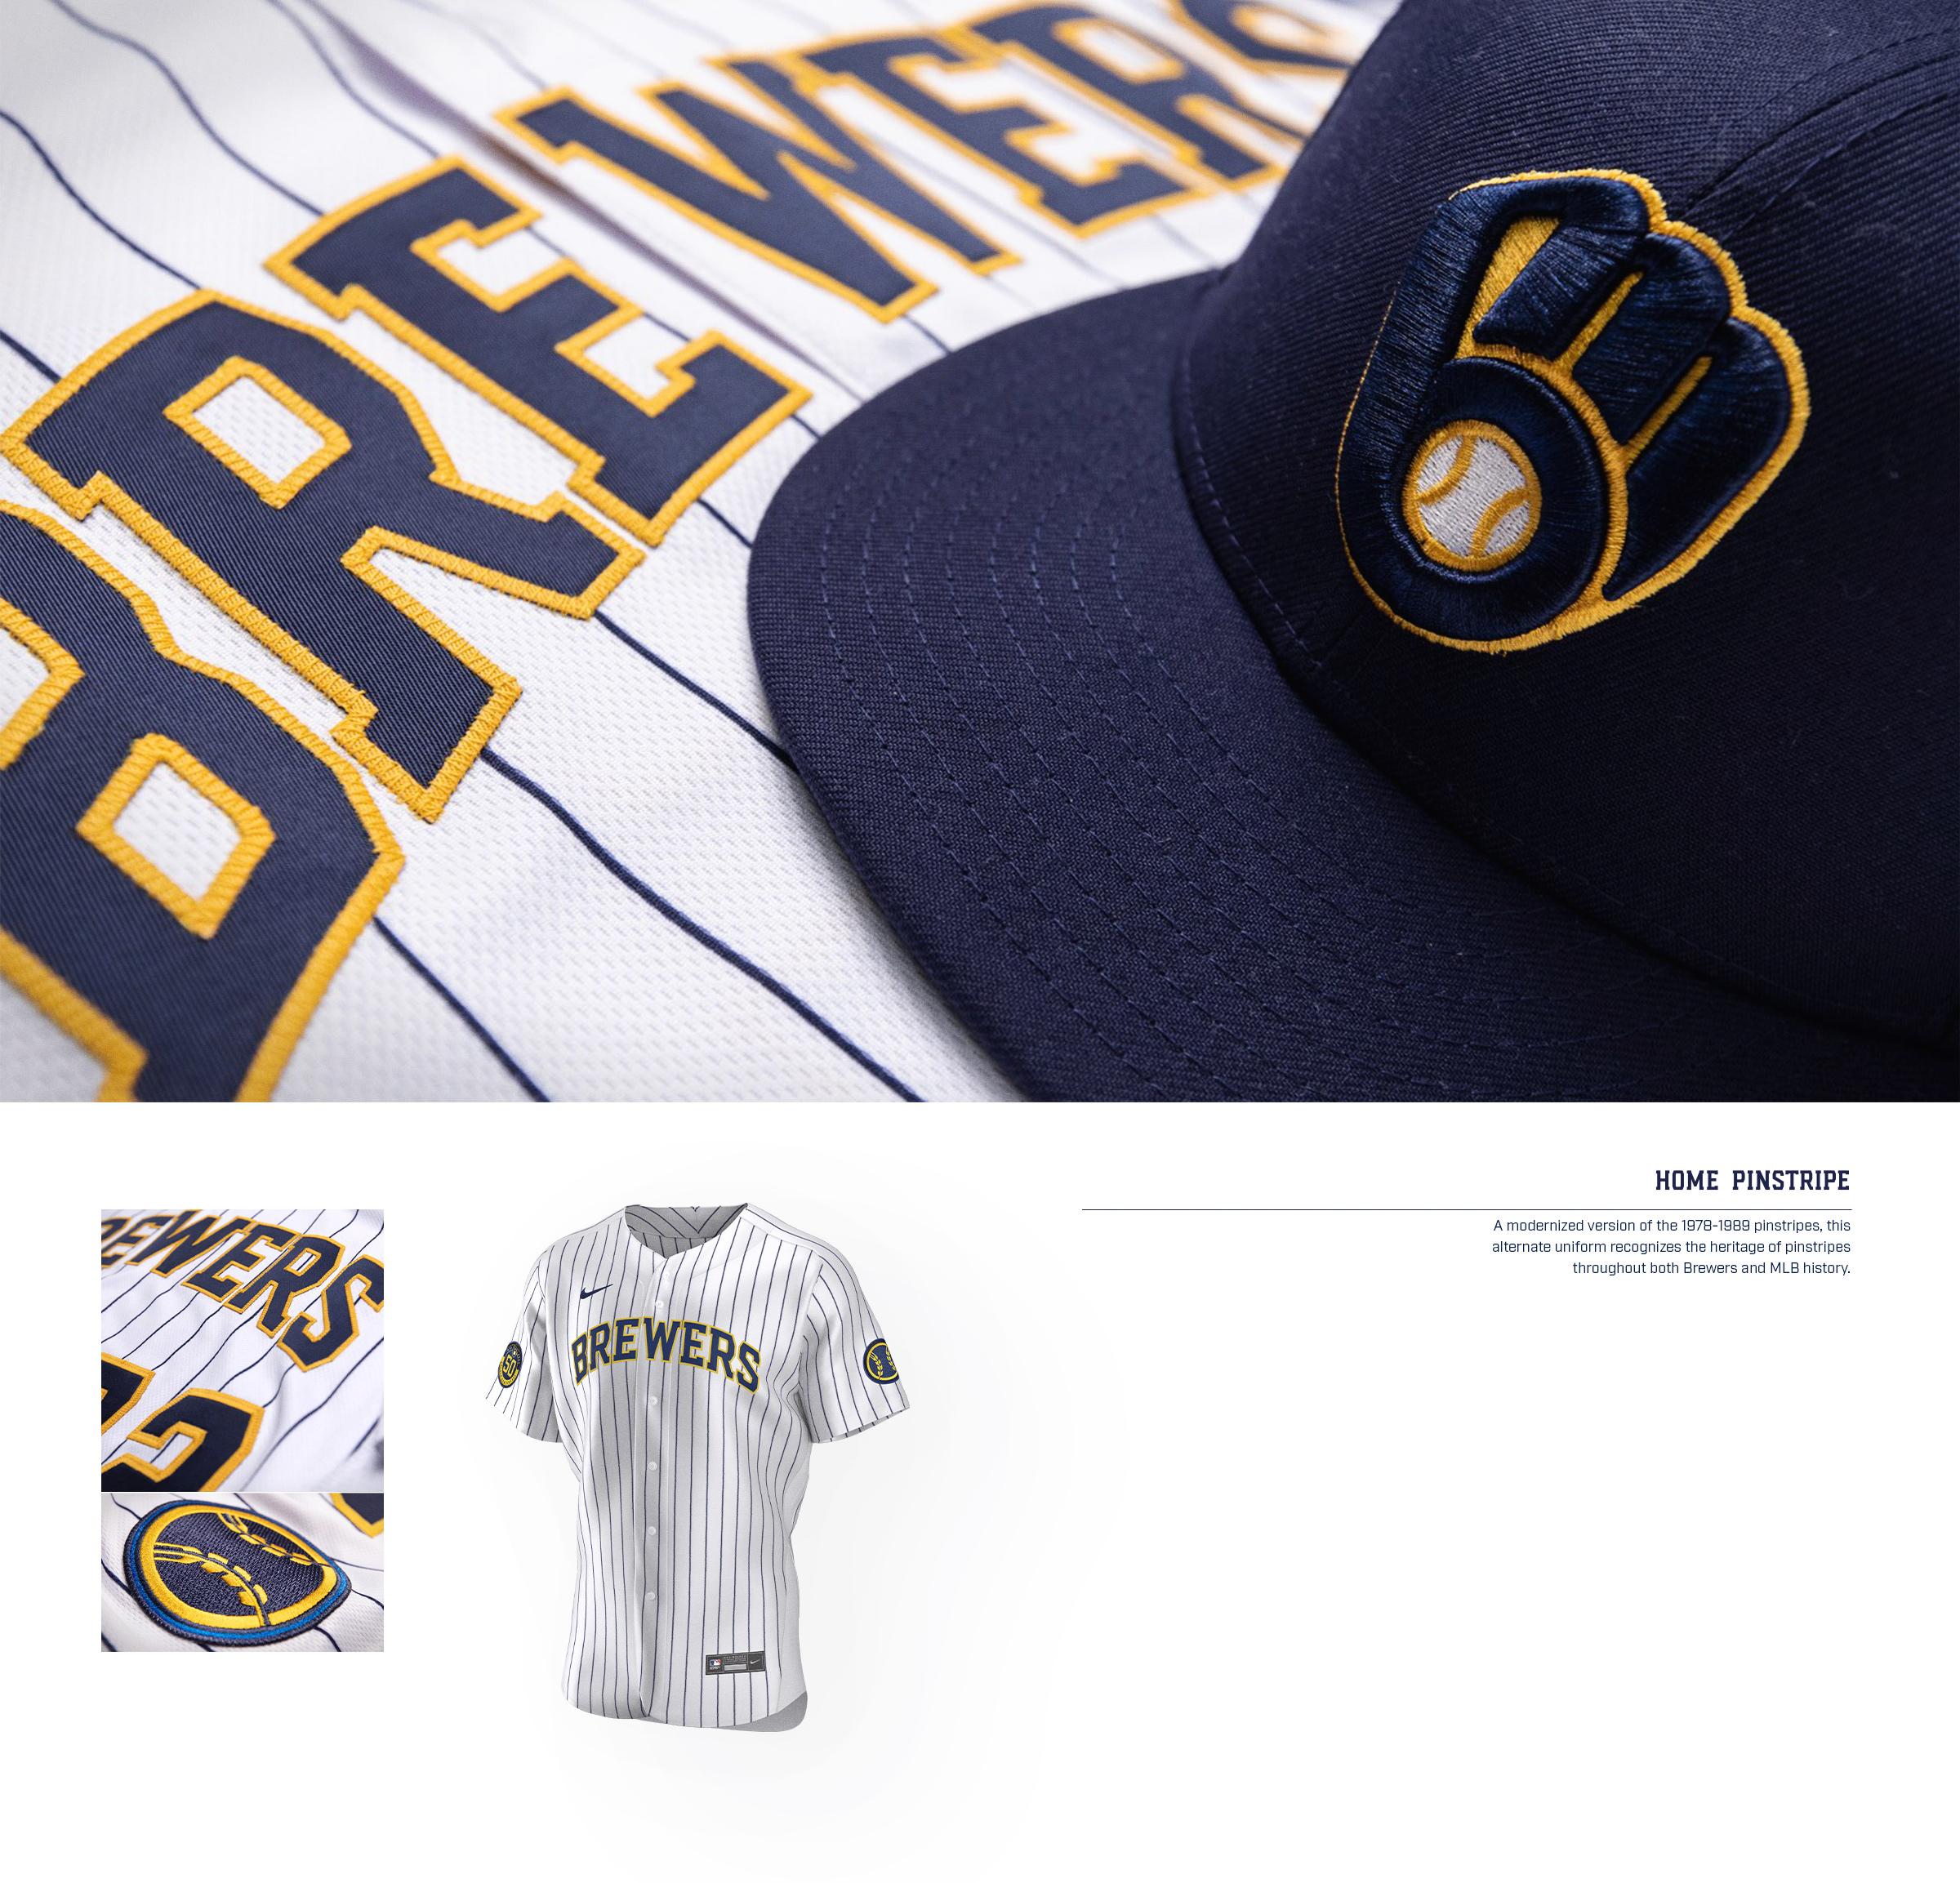 Brewers Uniform Home Pinstripe Jersey